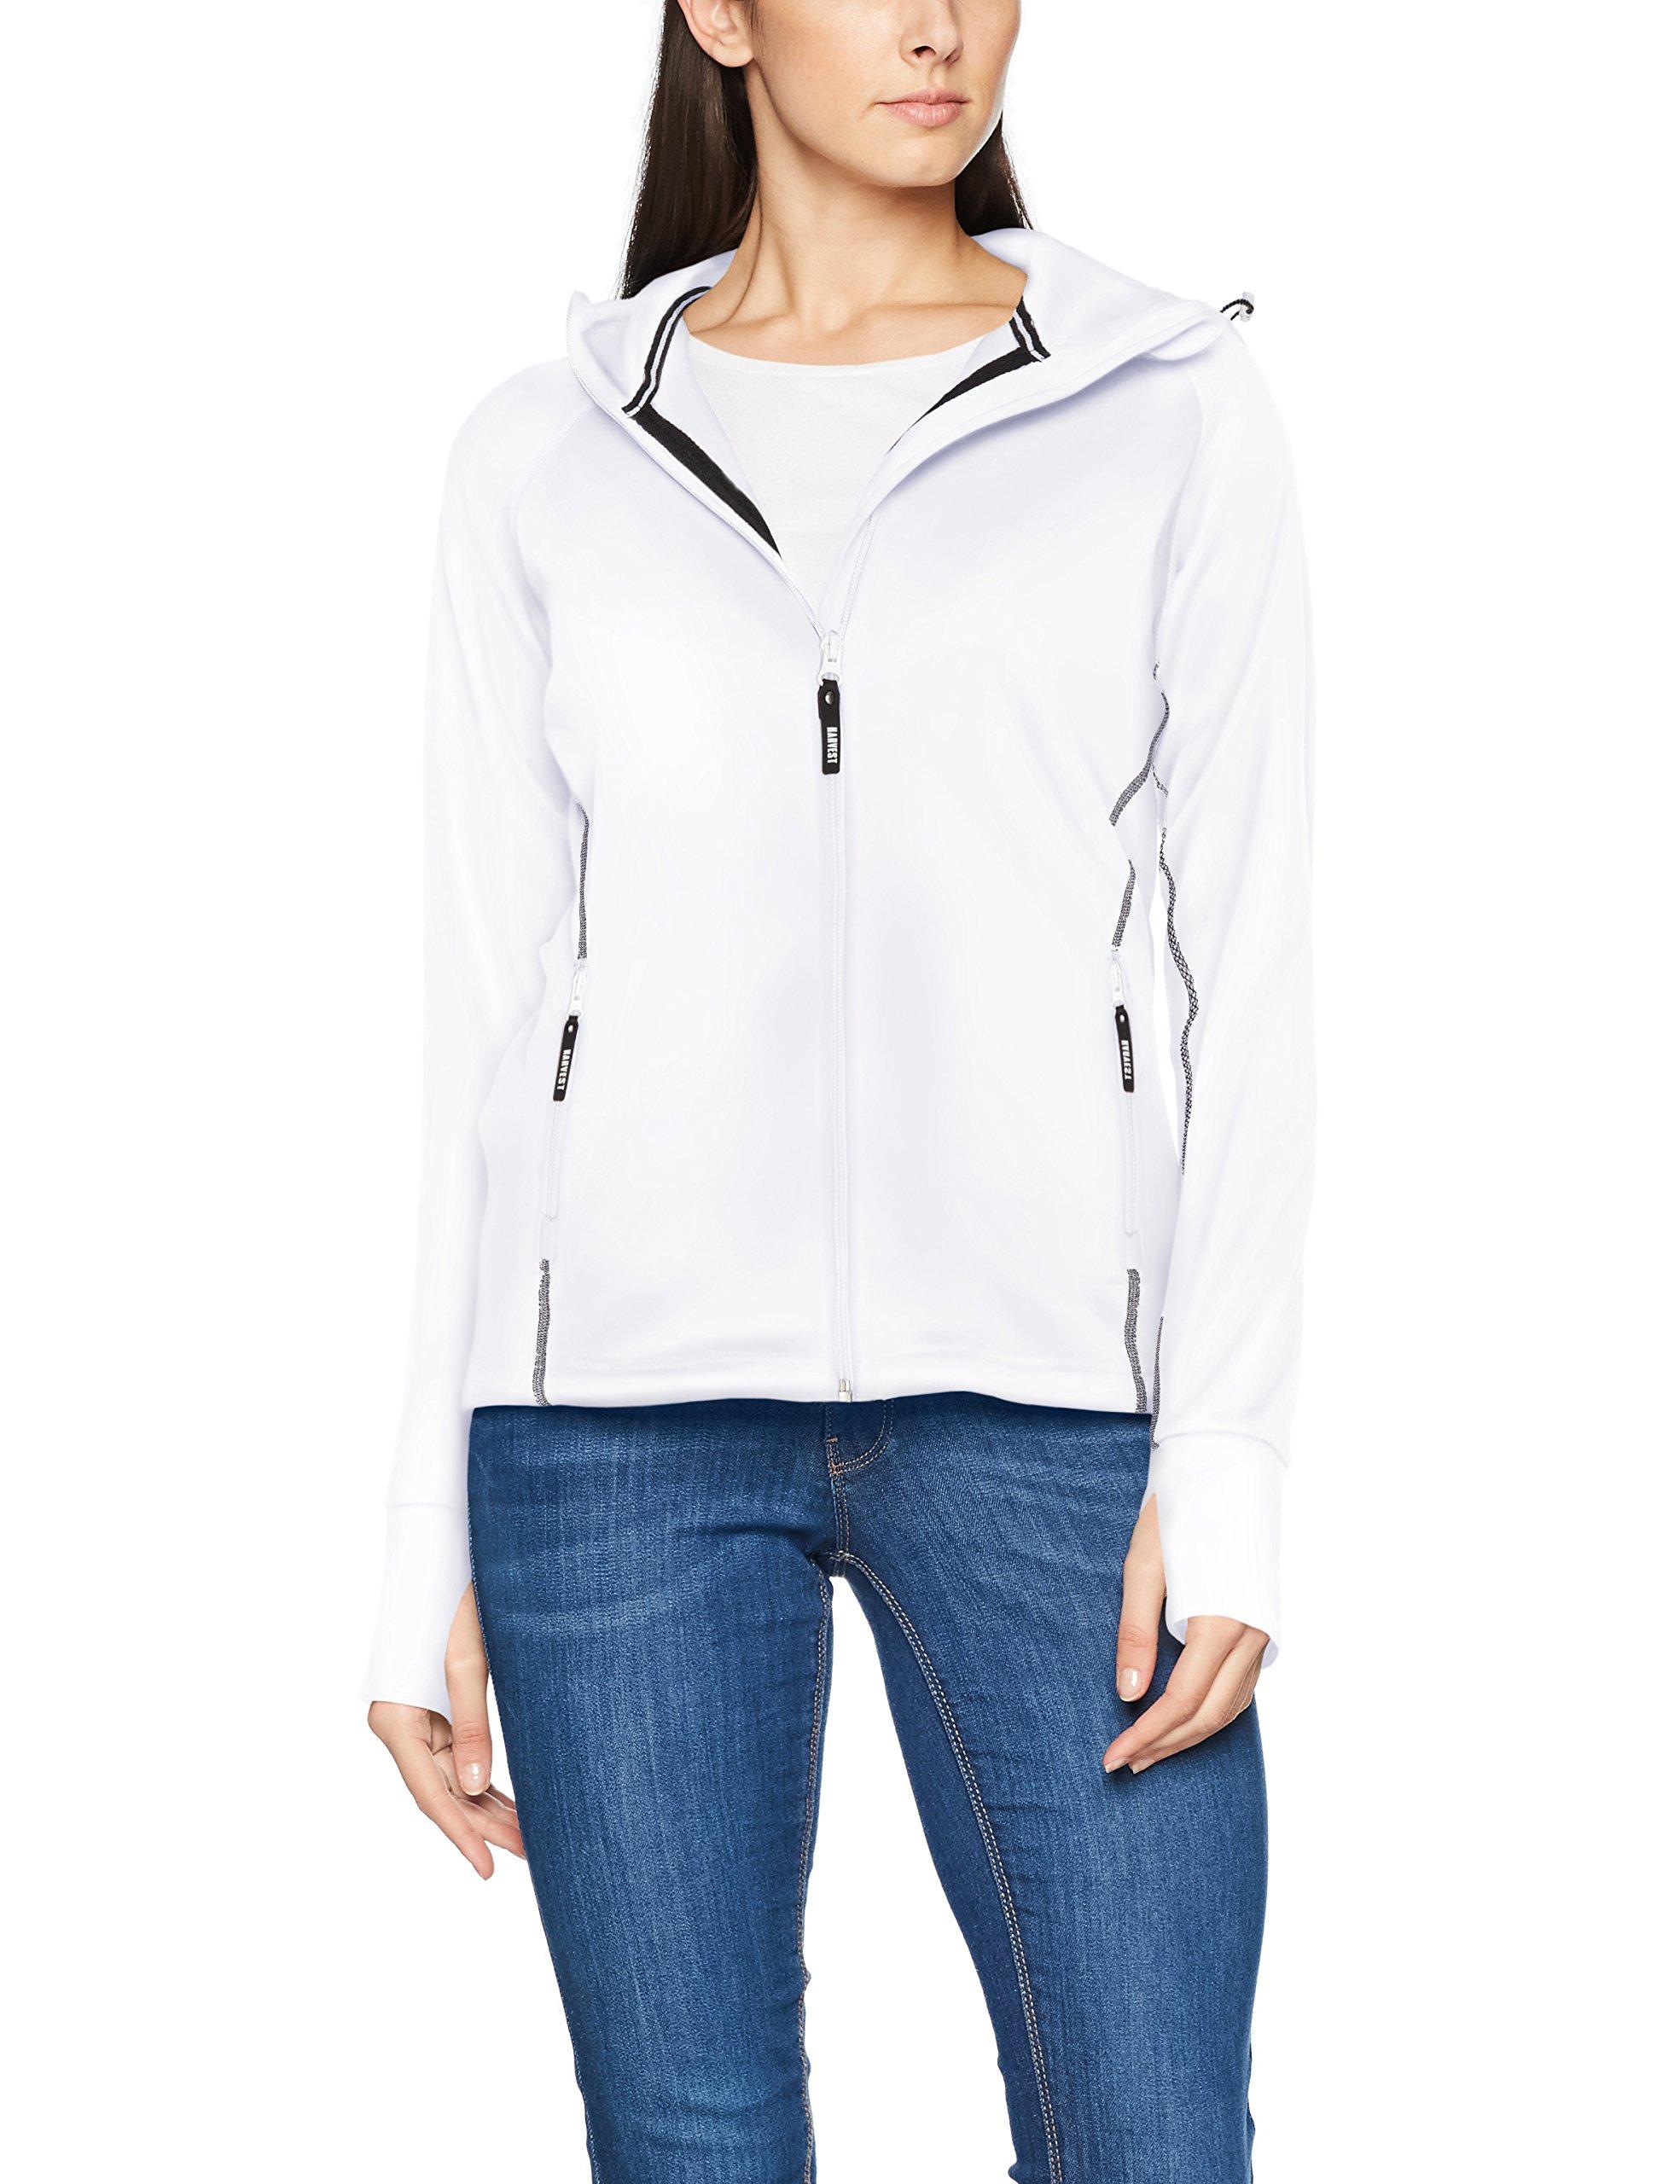 James Femme Northderry Zip 10034 Full BlousonBlancwhite Jacket Ladies Harvest Fleece stroQxdCBh